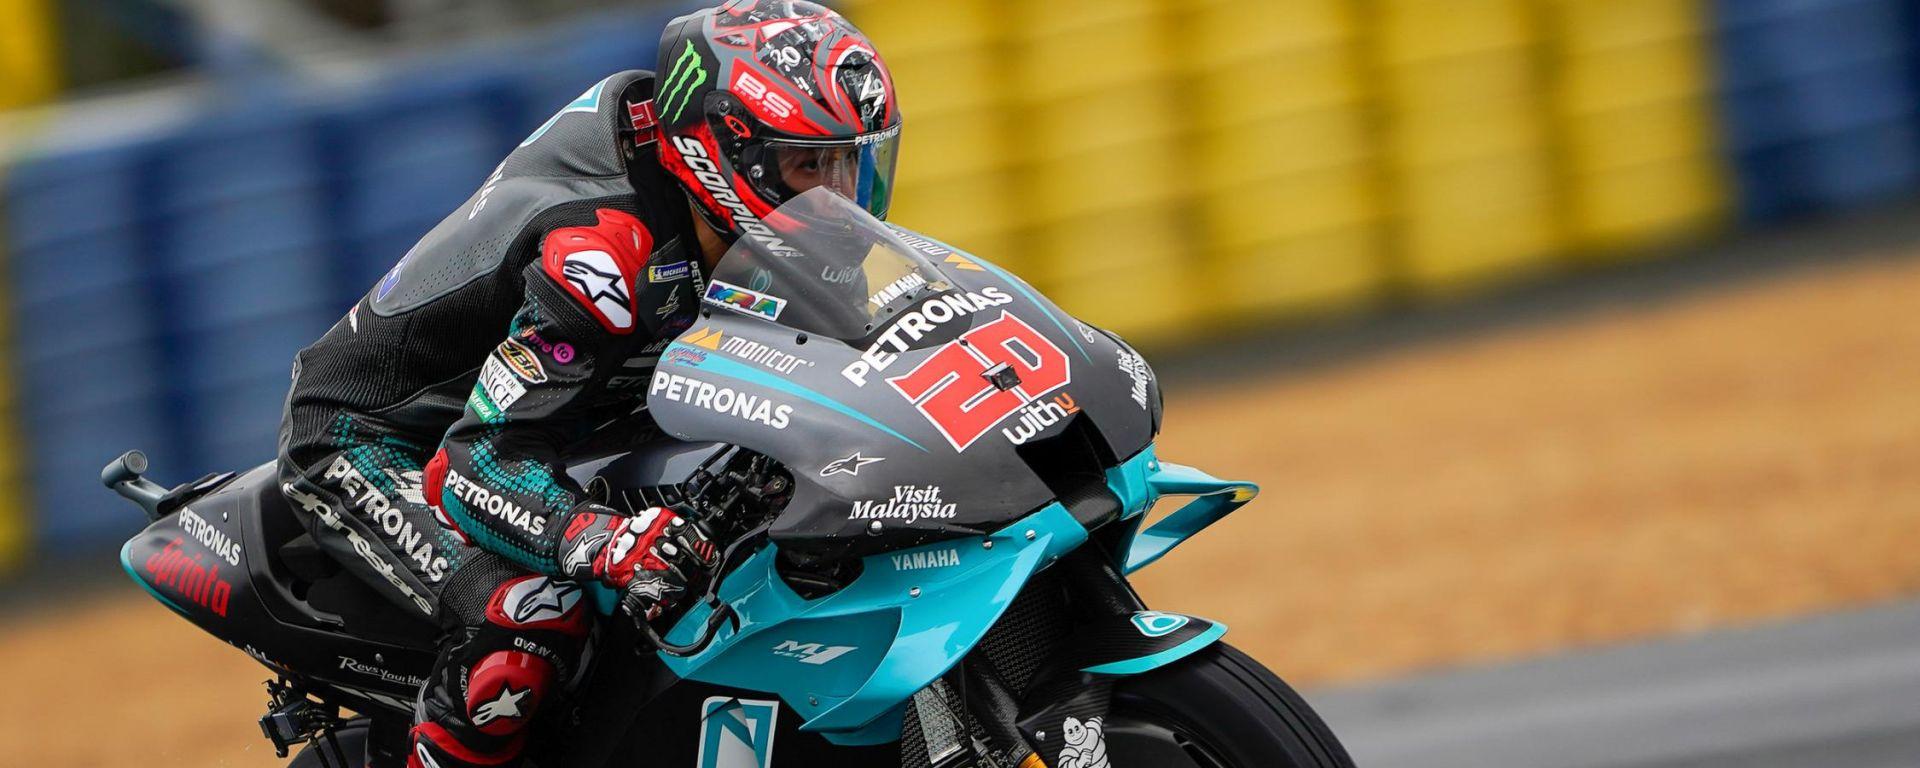 MotoGP, GP Francia 2020: Fabio Quartararo (Yamaha Petronas)